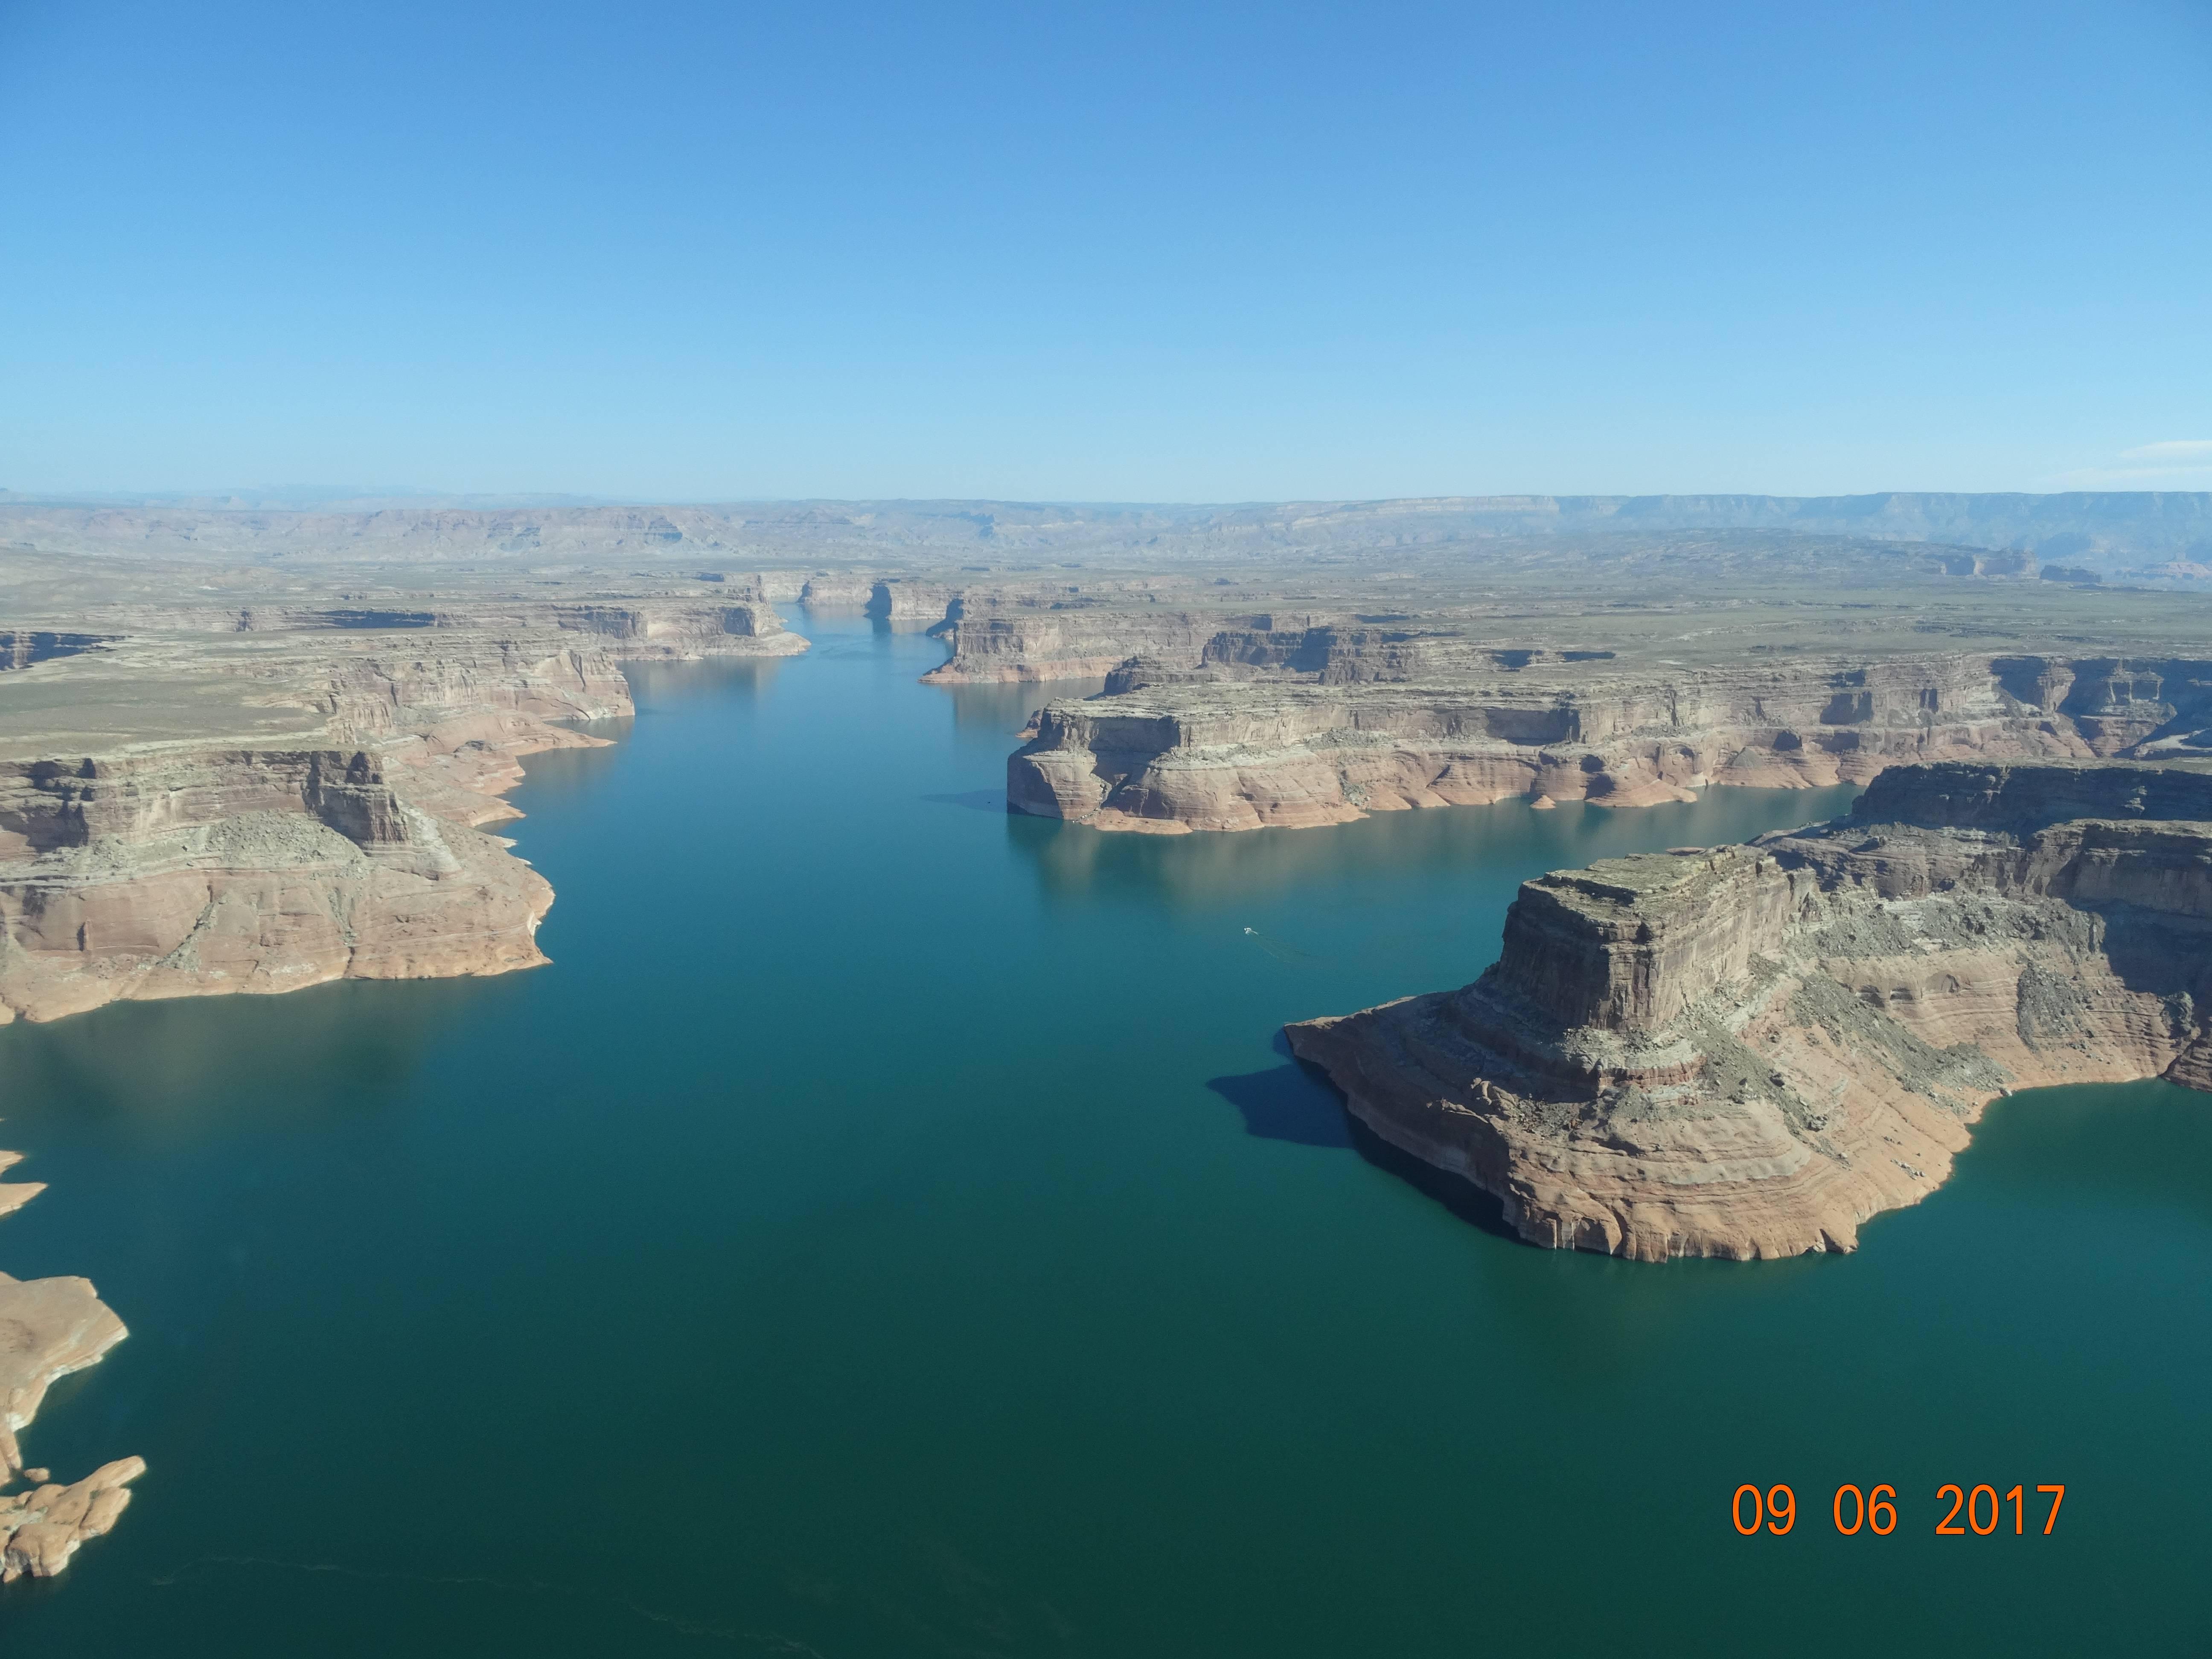 Photo 1: Lake Powell  - Arizona - USA